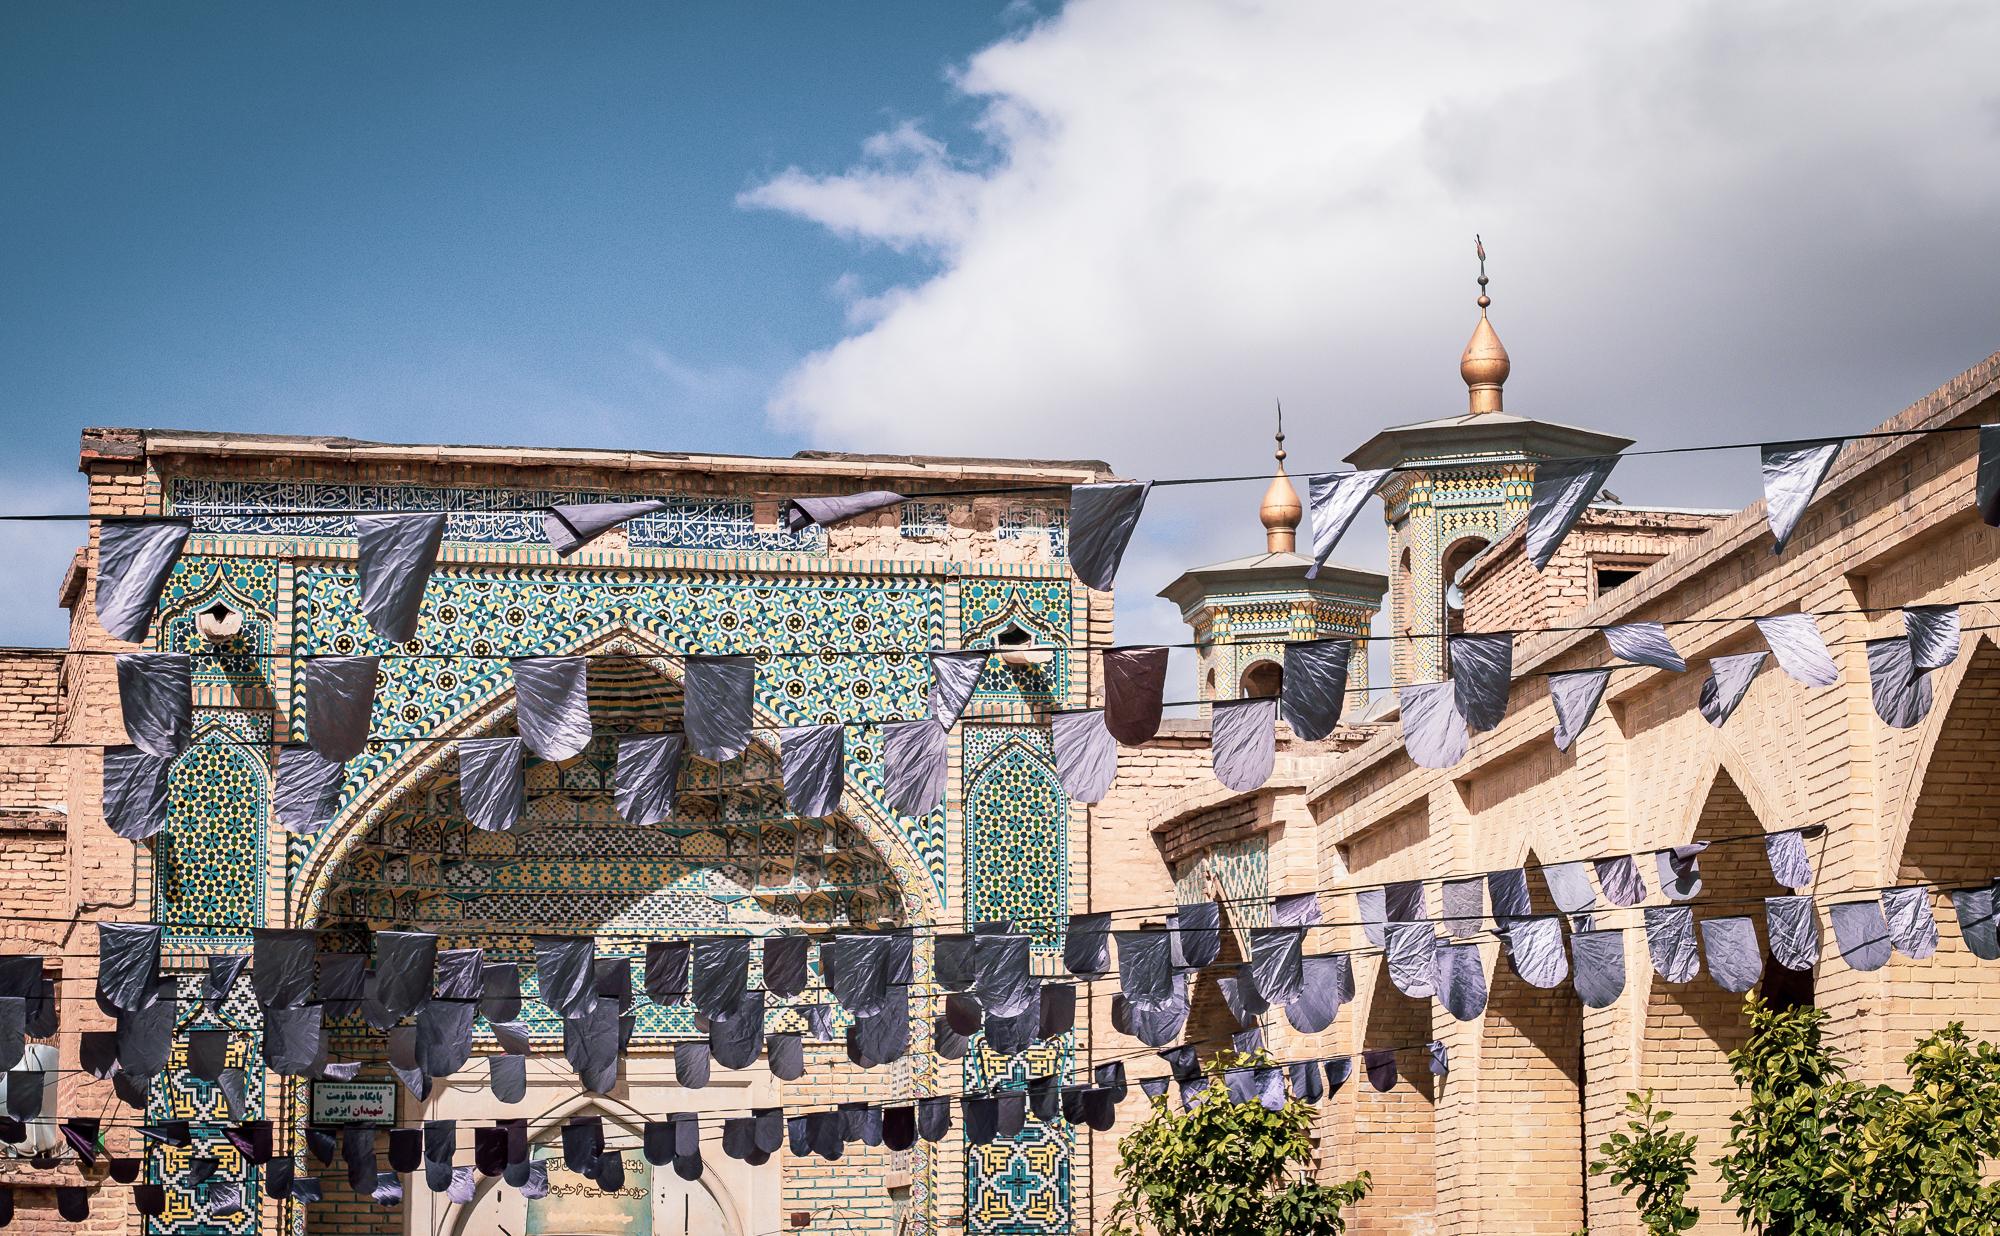 Tiles & Minarets